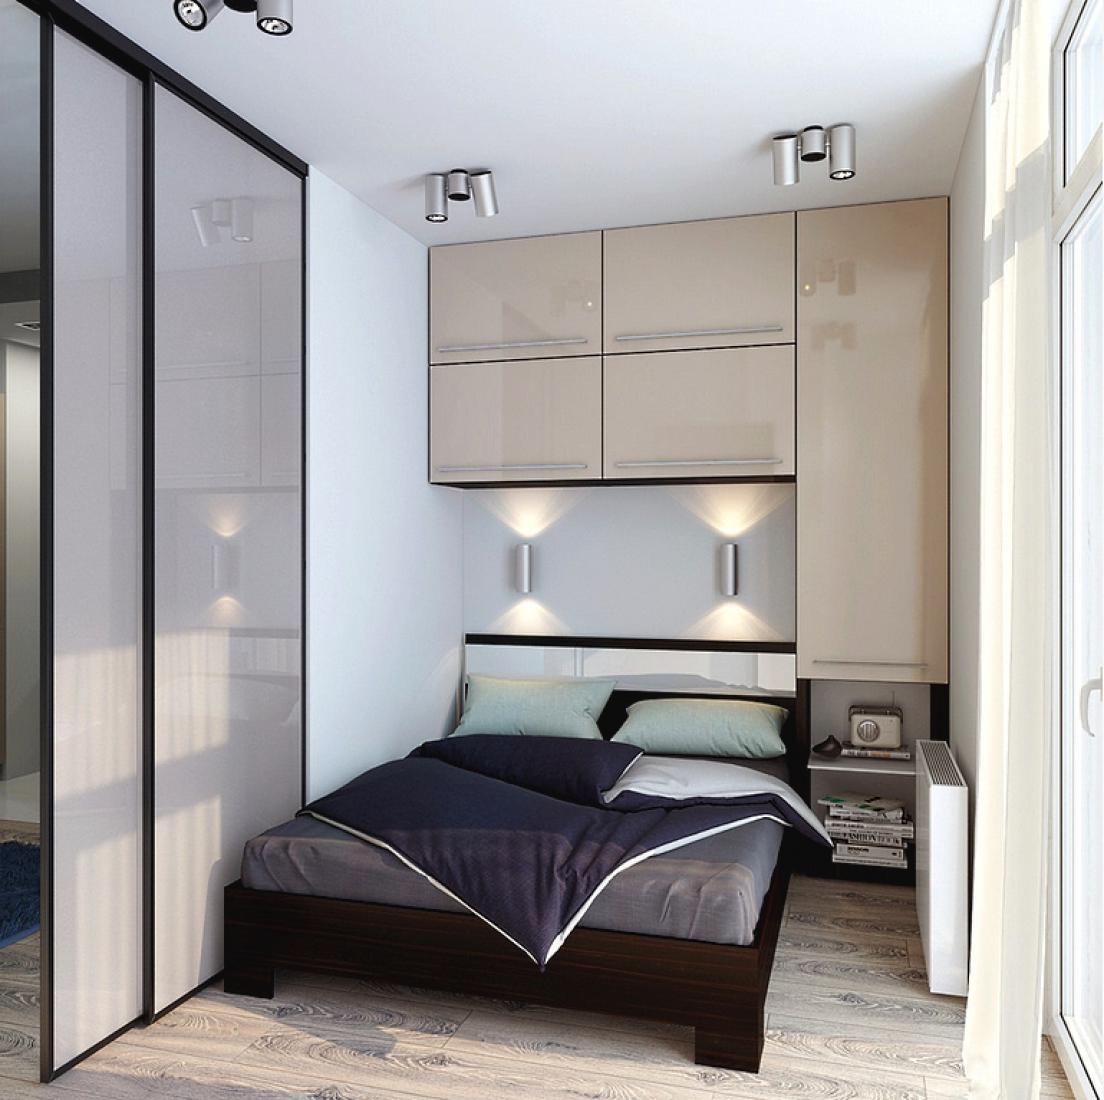 Шкафчики над кроватью